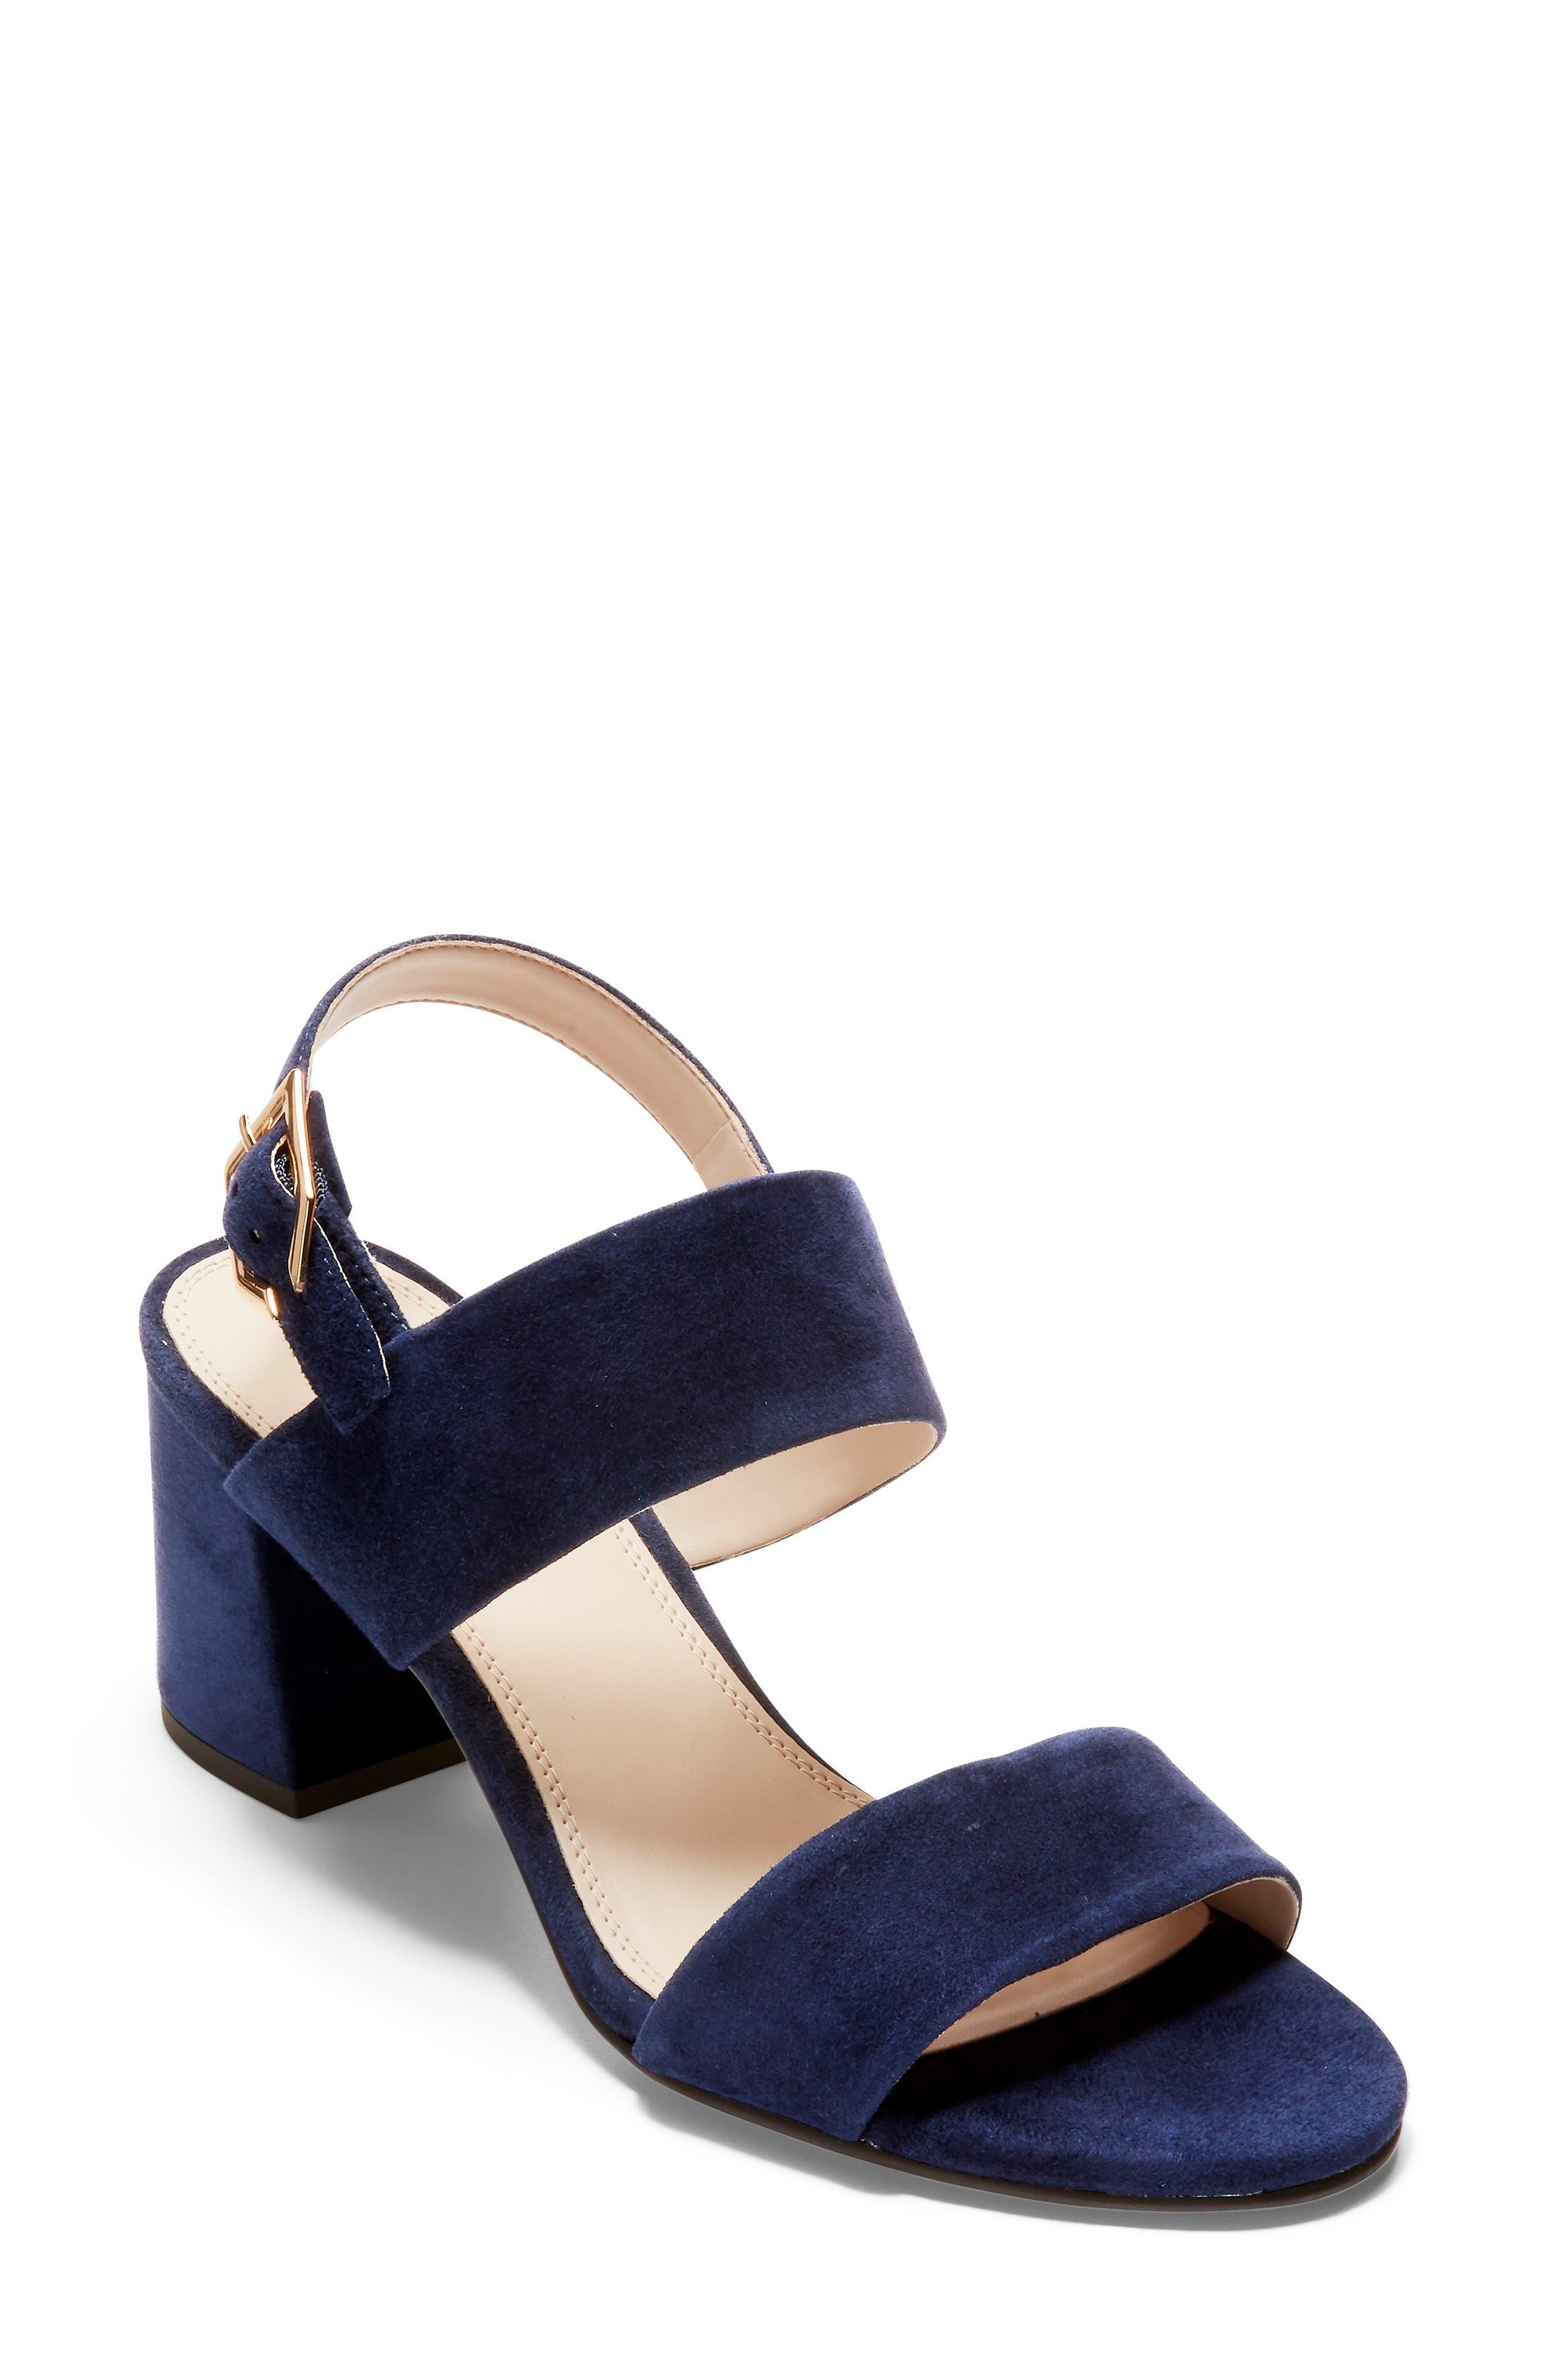 COLE HAAN, Avani Block Heel Sandal, Main thumbnail 1, color, MARINE BLUE SUEDE